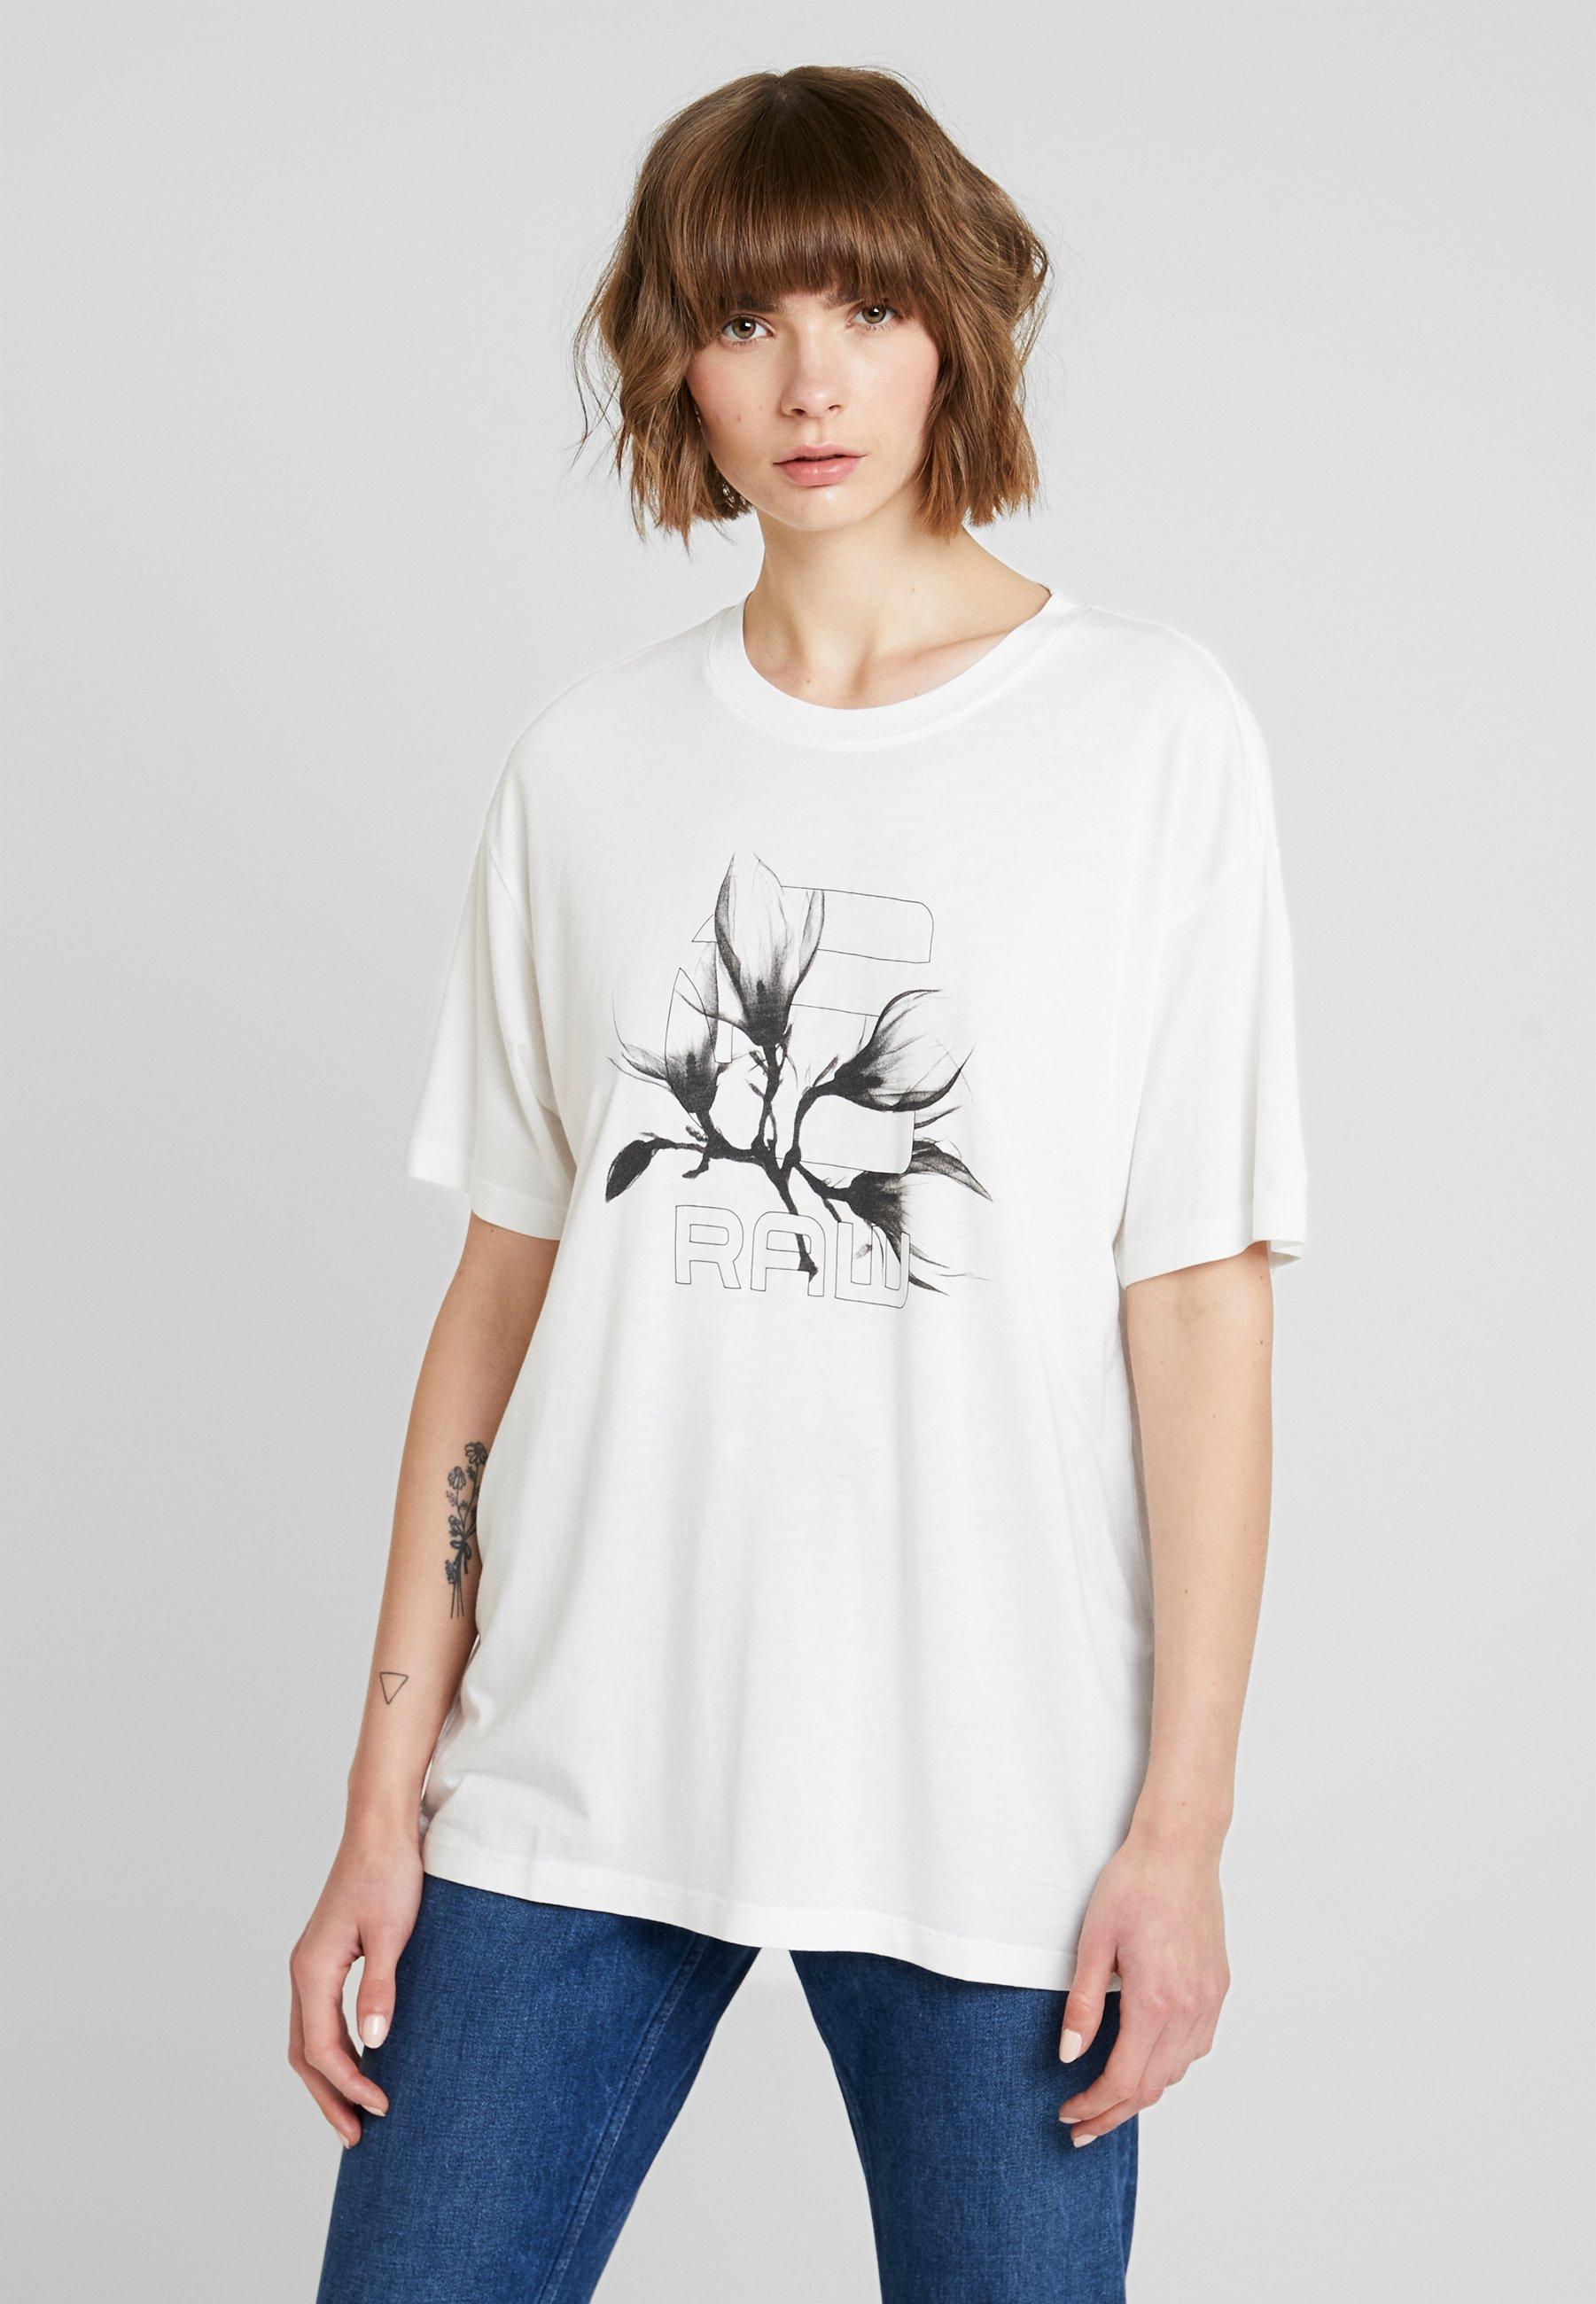 shirt Rijks Graphic Bf Wmn sT T star Imprimé R G 21 Milk S zMSUVp